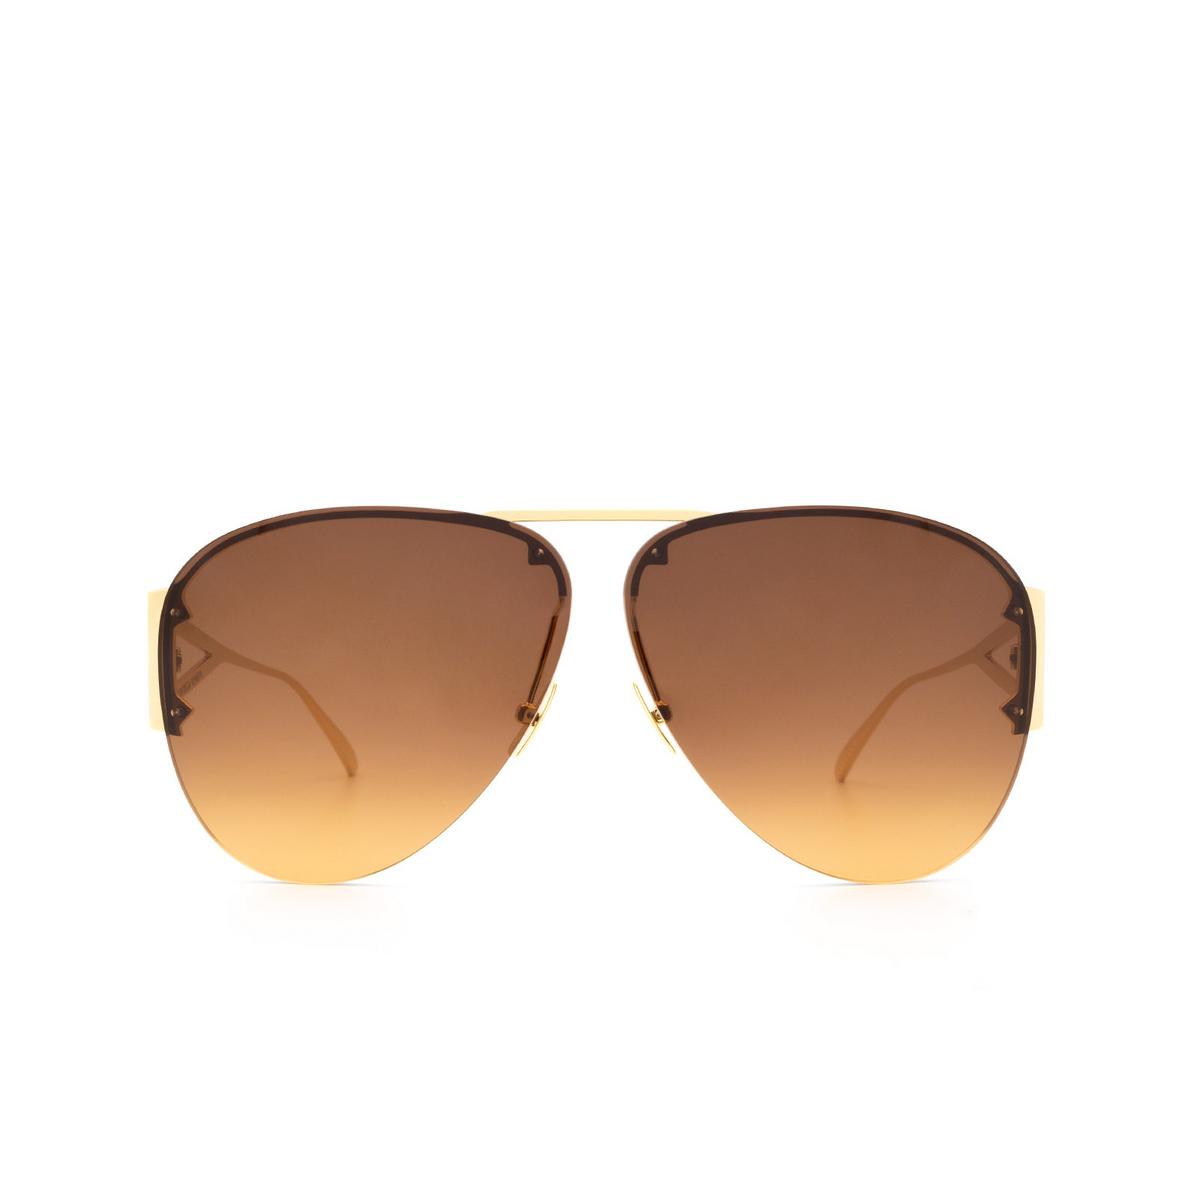 Bottega Veneta® Aviator Sunglasses: BV1066S color Shiny Gold Lv 002 - front view.